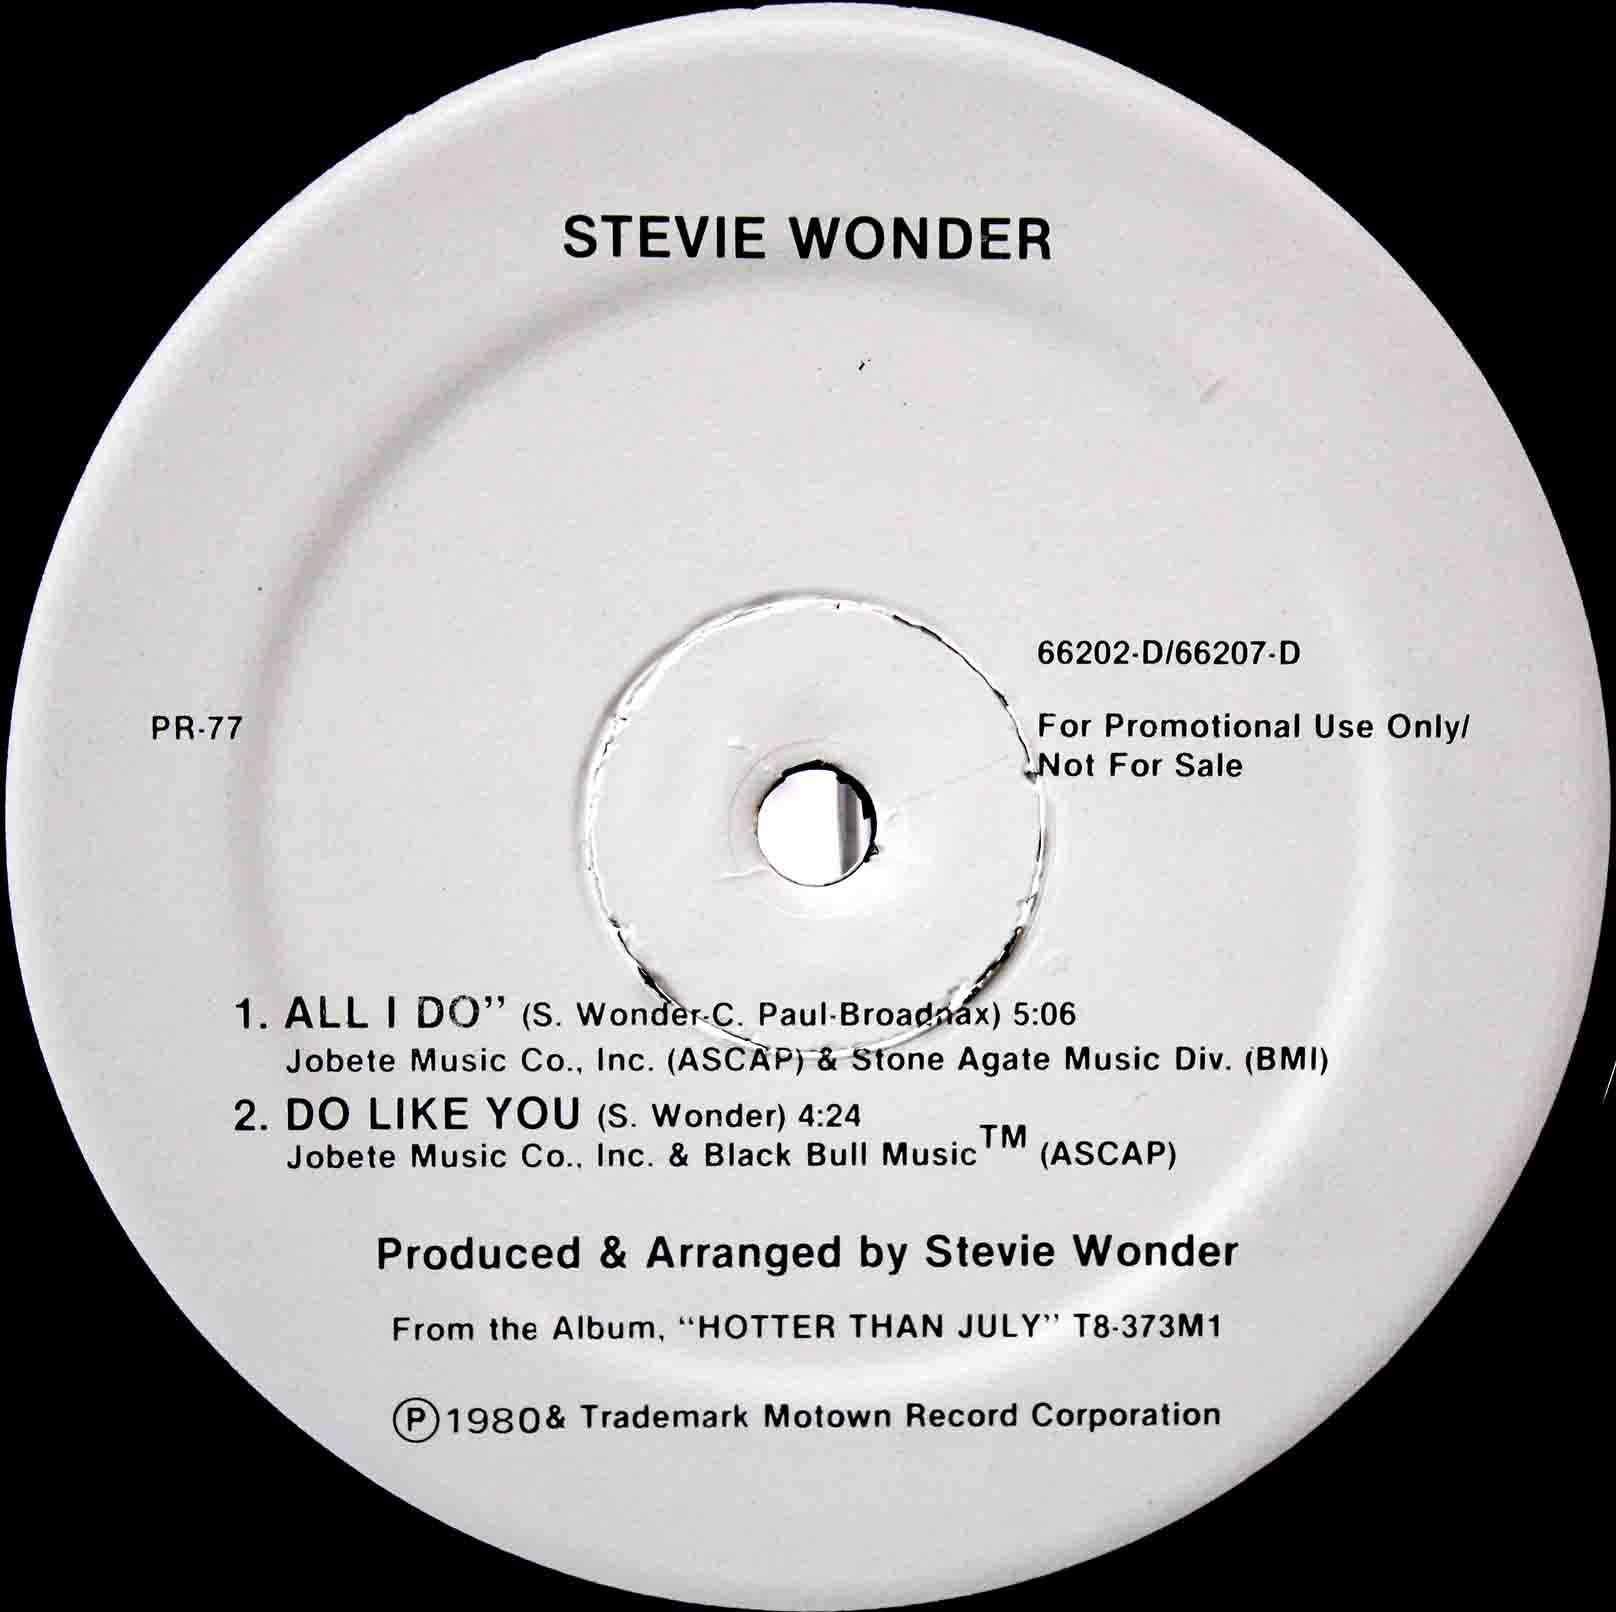 Stevie Wonder - do like you 02